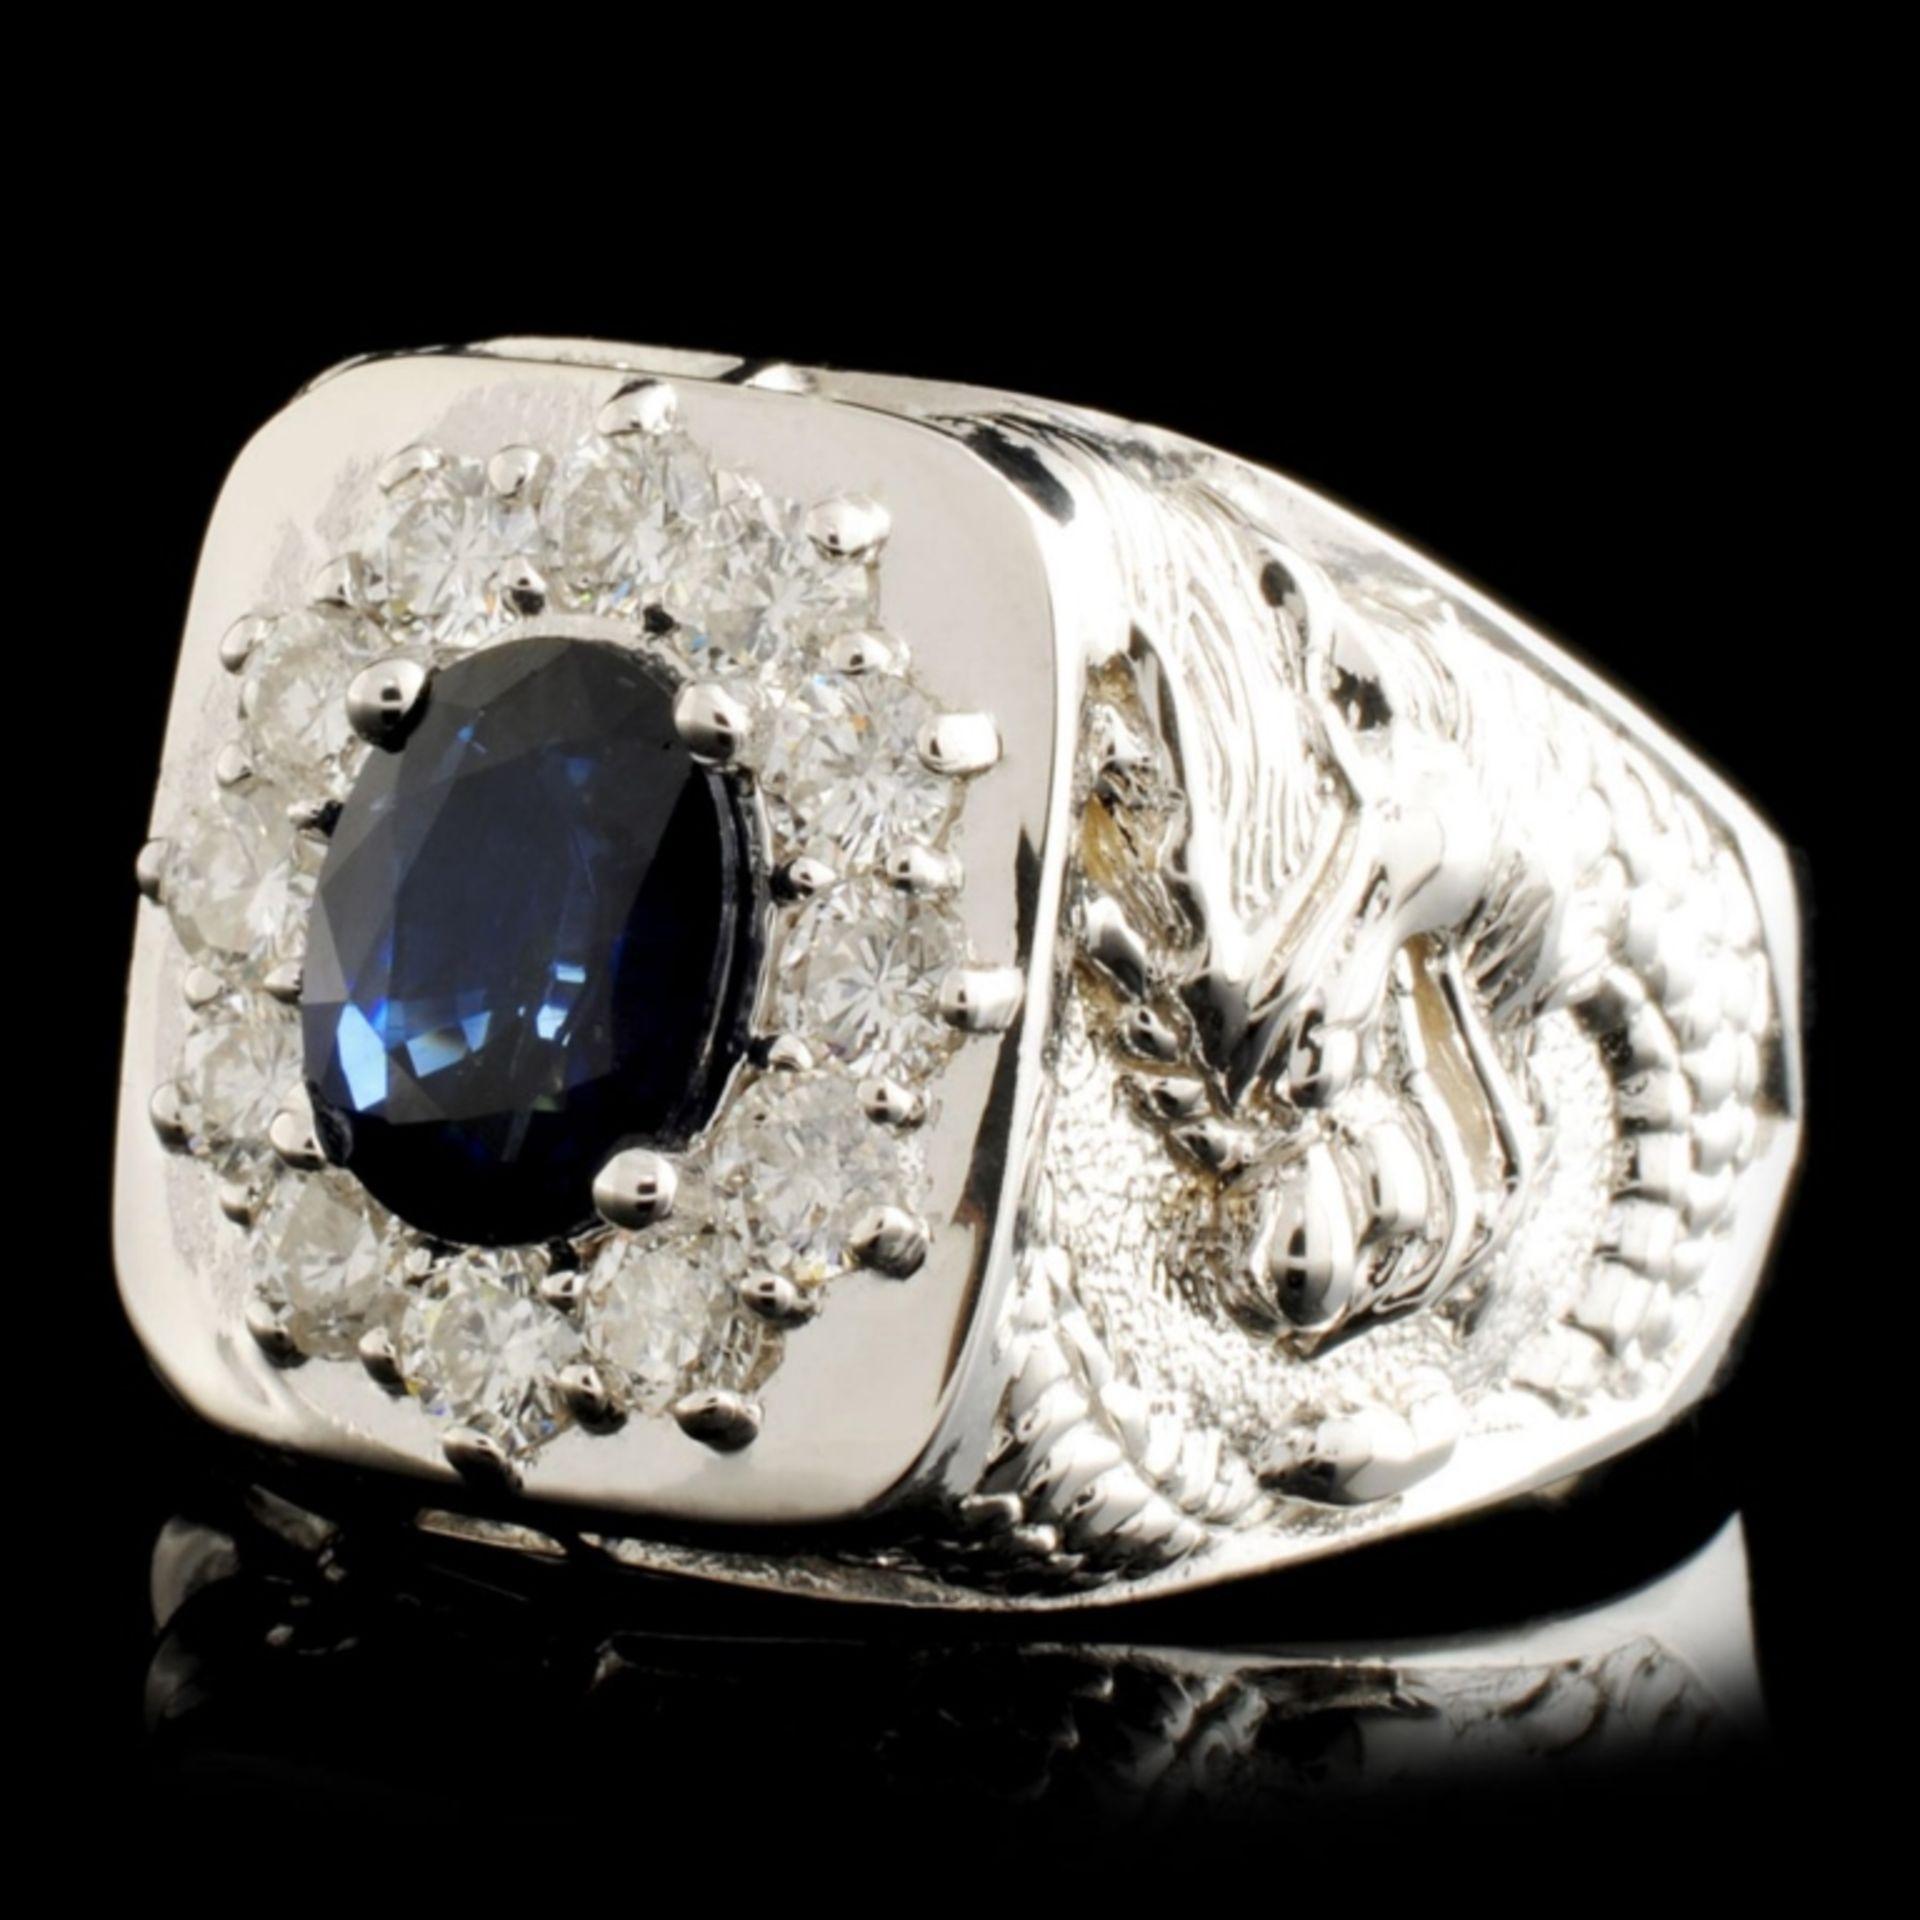 14K Gold 2.00ct Sapphire & 0.90ctw Diamond Ring - Image 2 of 5